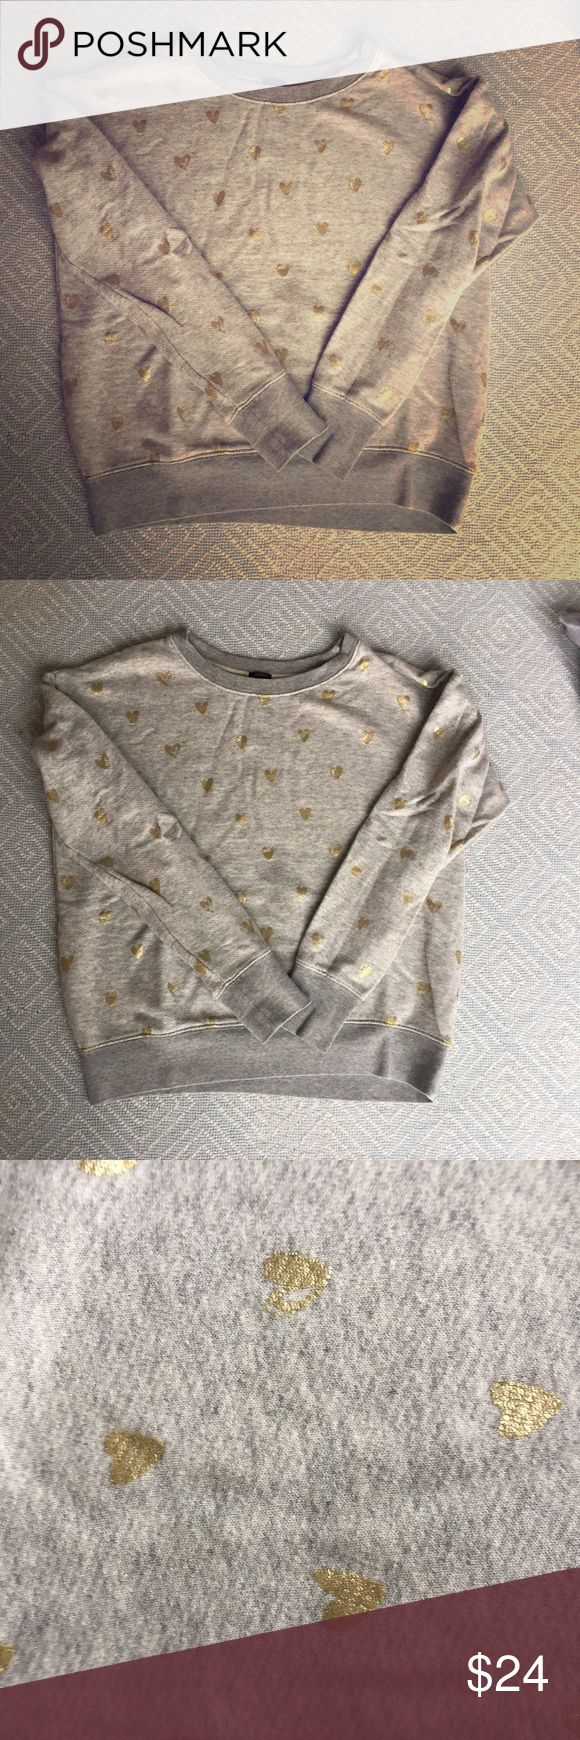 Ladies J Crew Cotton Sweatshirt, Gray with 💛 Ladies gray sweatshirt with gold Metallic hearts, size small. 100% Cotton. J. Crew Tops Sweatshirts & Hoodies